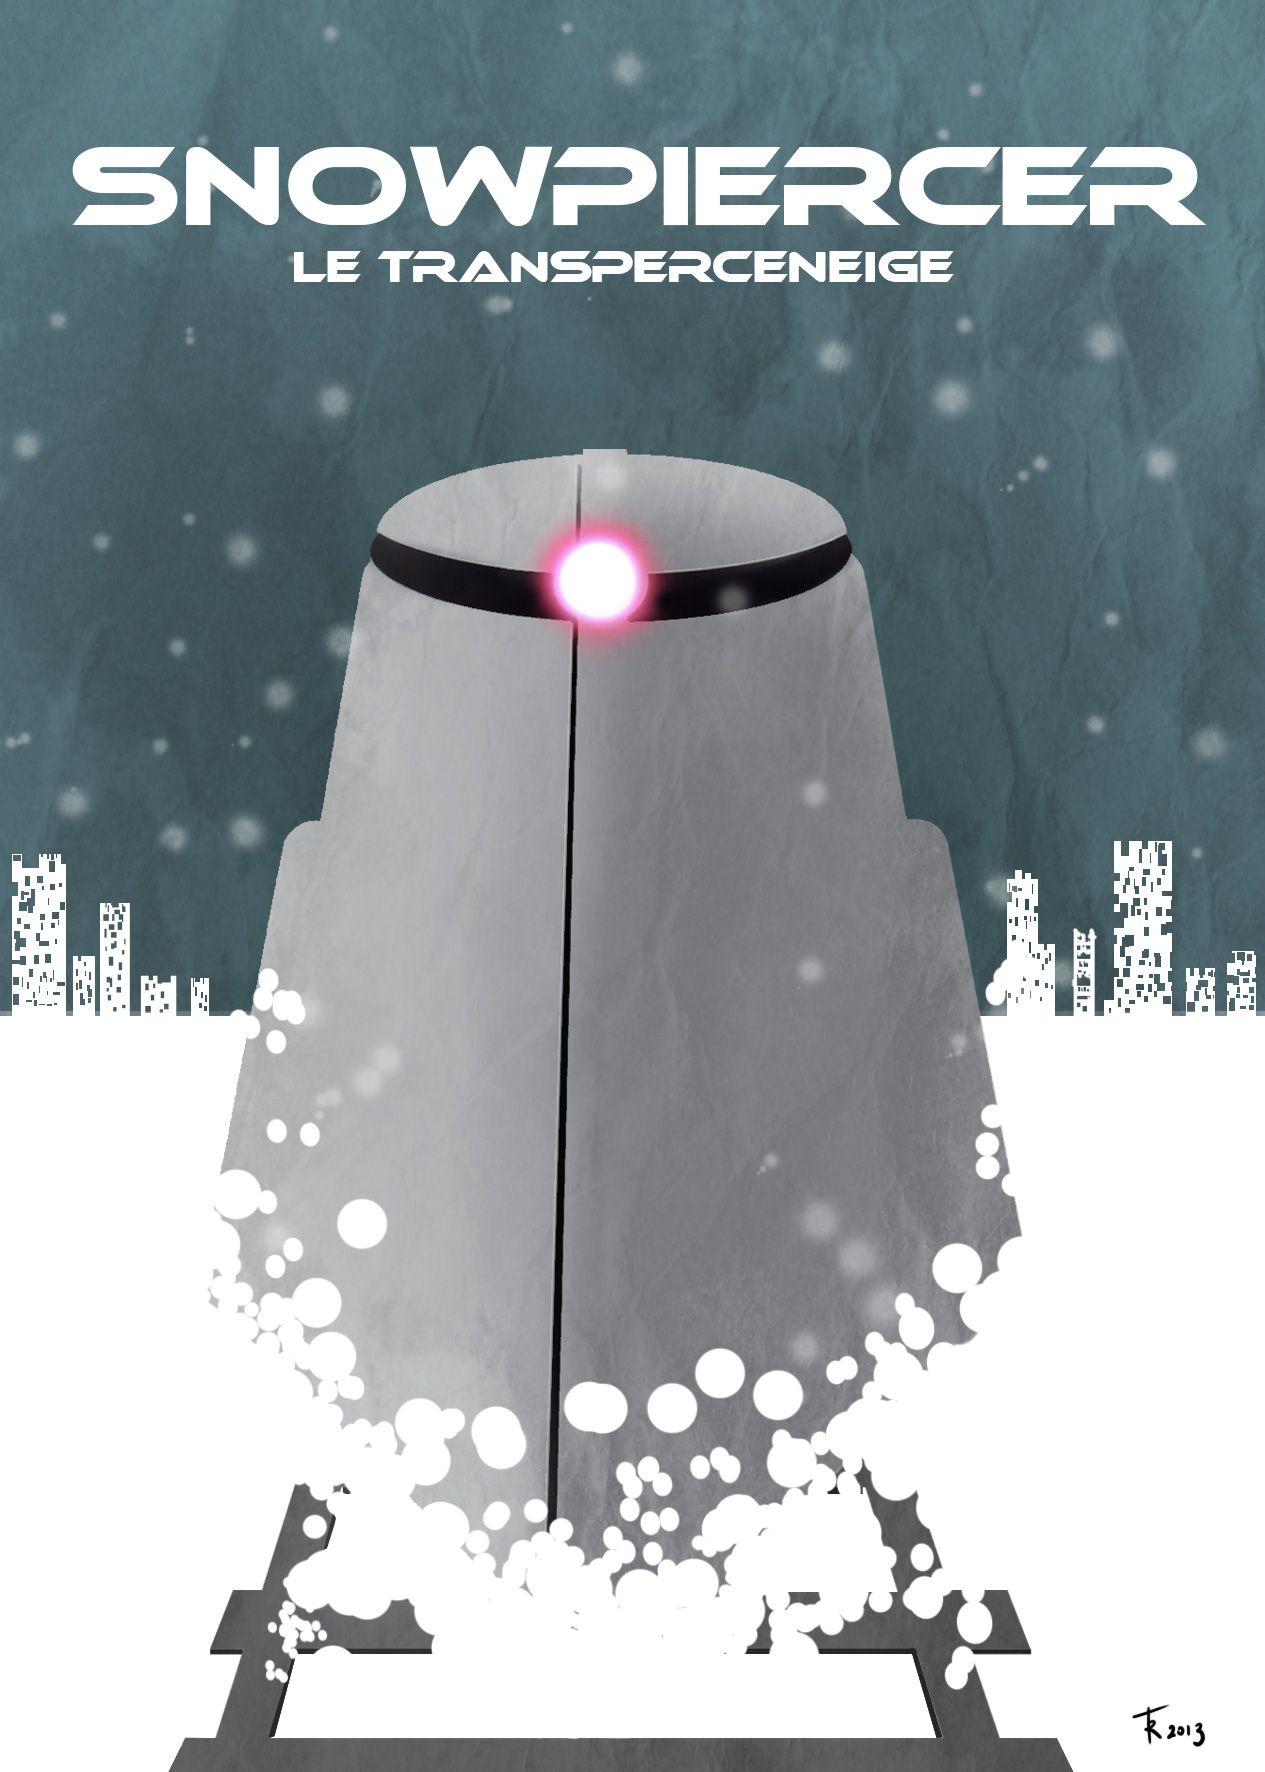 Snowpiercer poster fan art by rafgraphicart. http://www ...